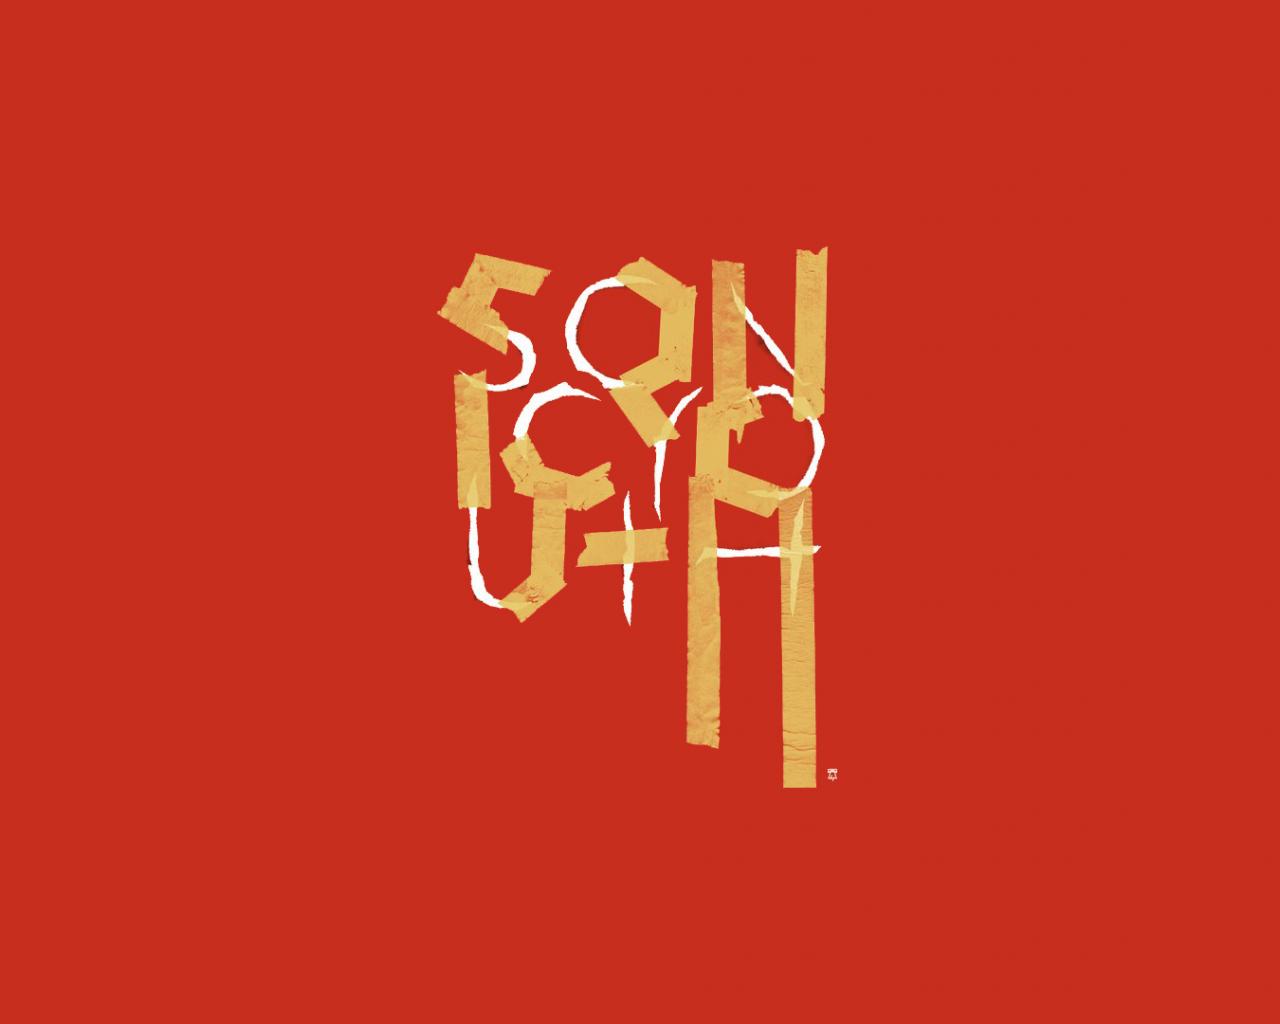 Free Download Sonic Youth Desktop Wallpaper 171 Zeblogco